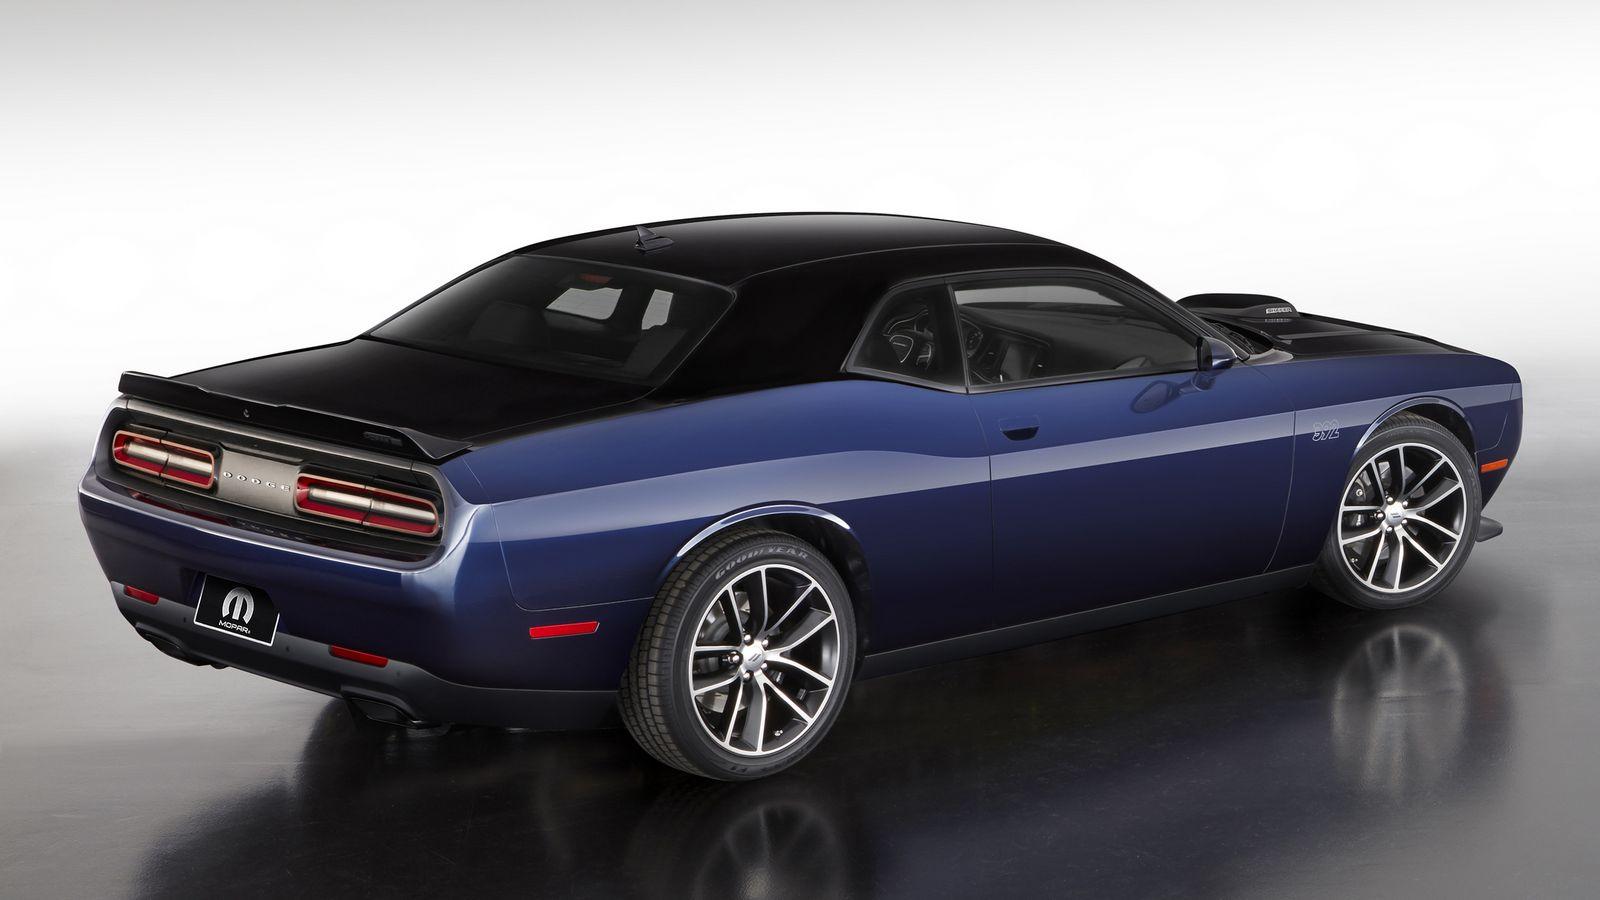 Dodge Challenger Mopar 2017 (2)